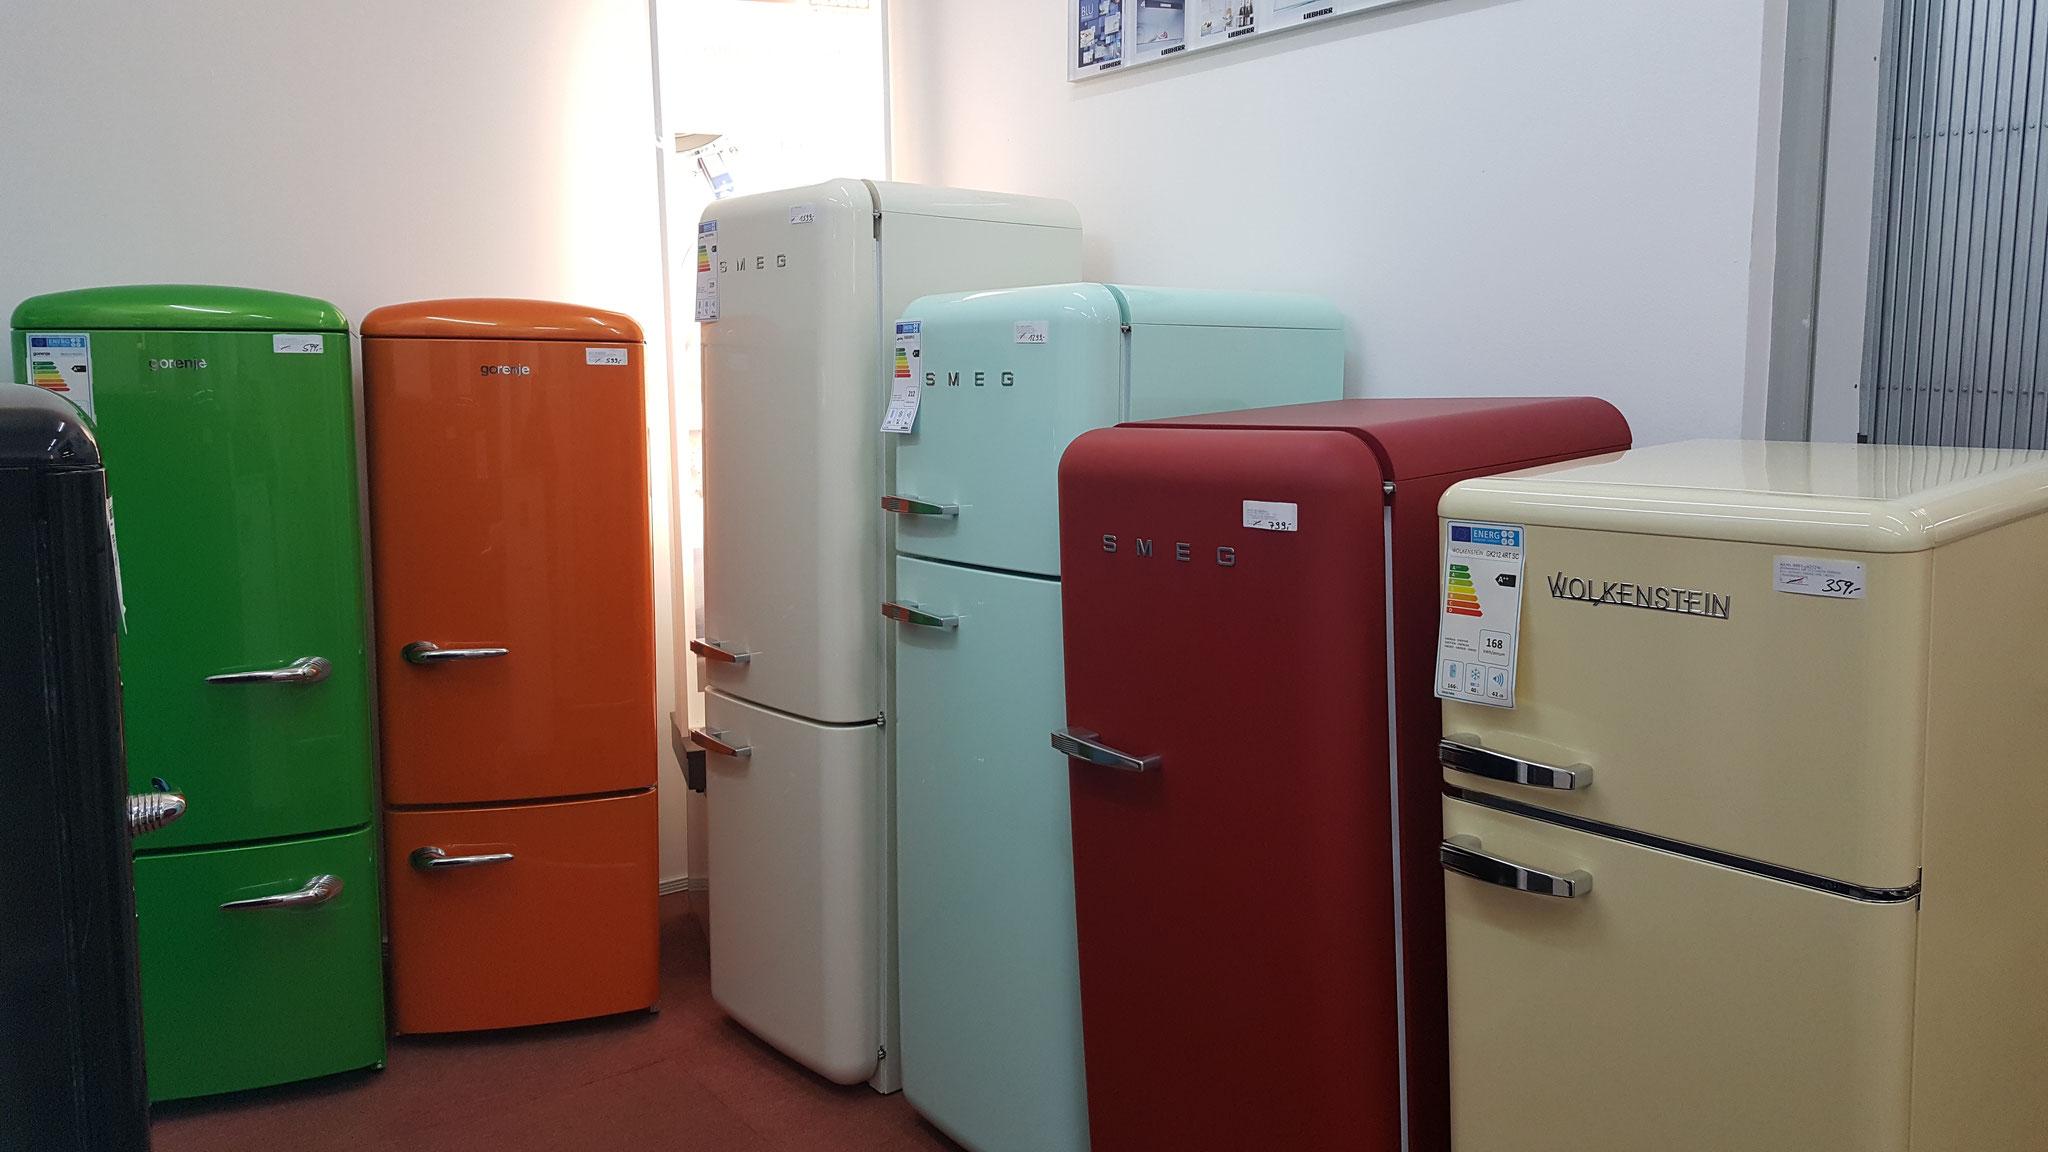 Retro Kühlschrank Rot Gorenje : Gorenje retro kühlschränke als fußball spezial elektrojournal